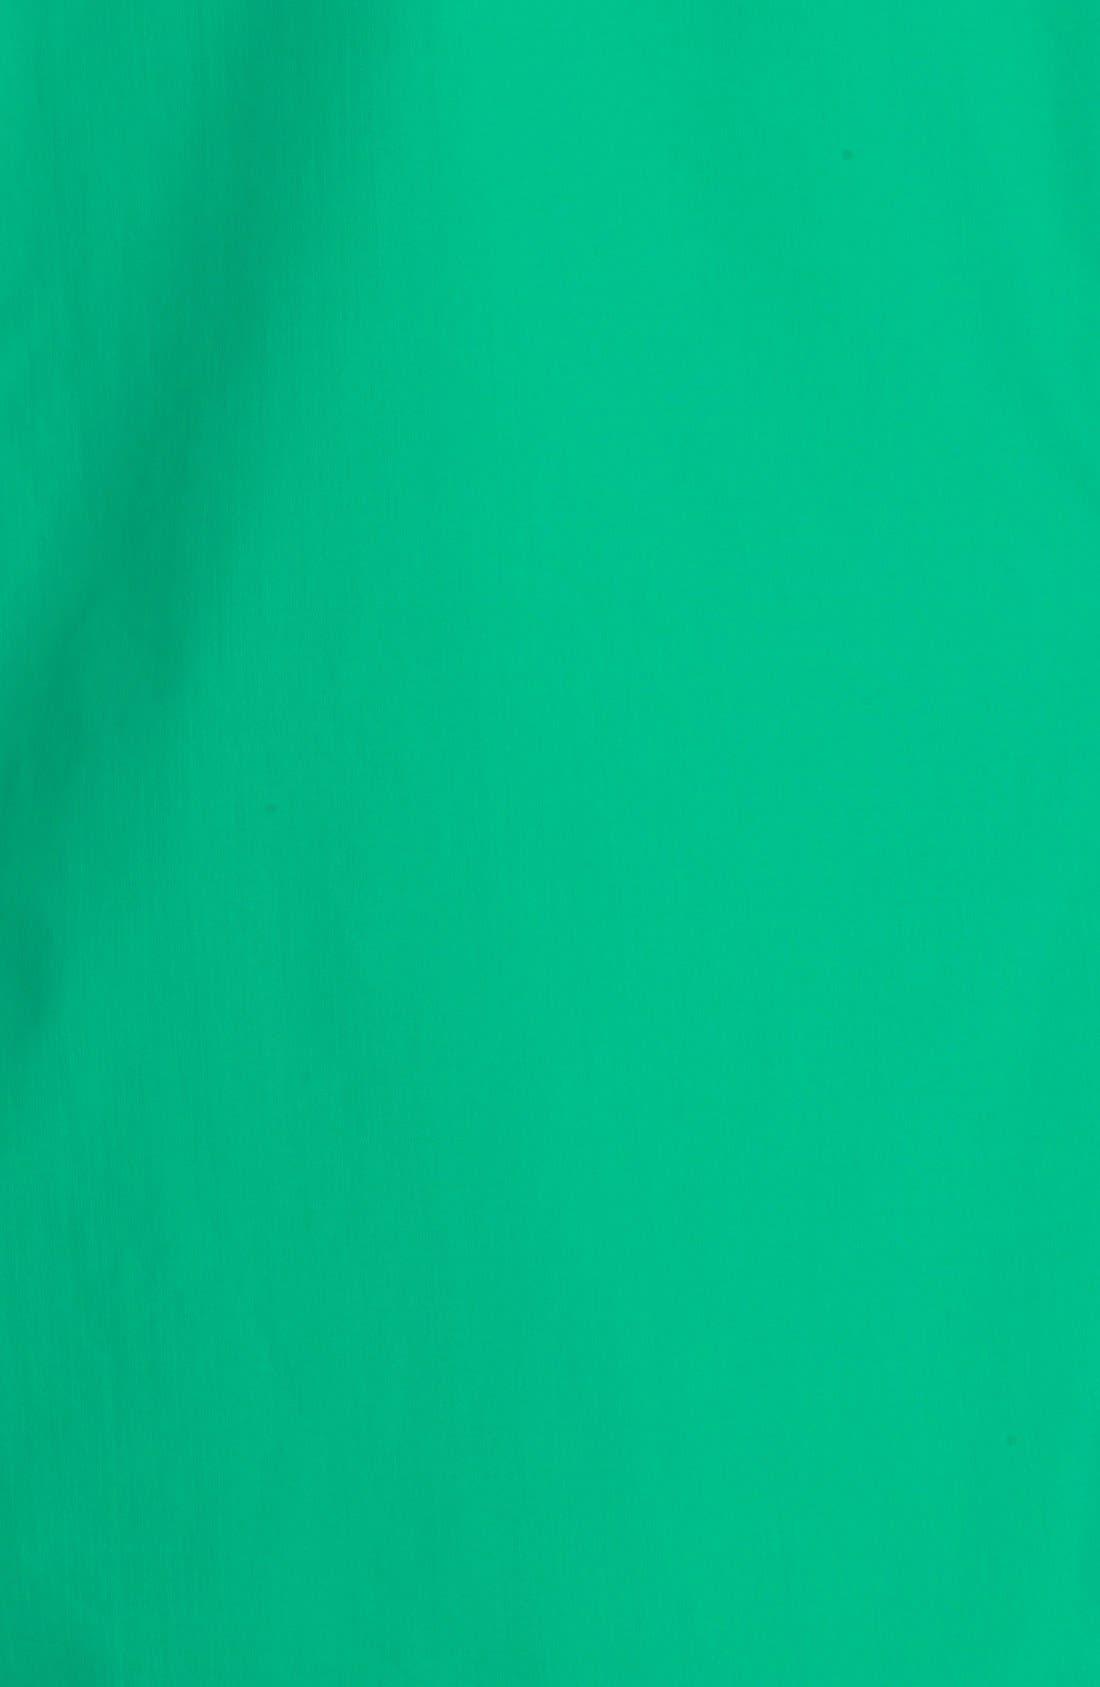 'Beta SL' Waterproof Jacket,                             Alternate thumbnail 6, color,                             Parakeet